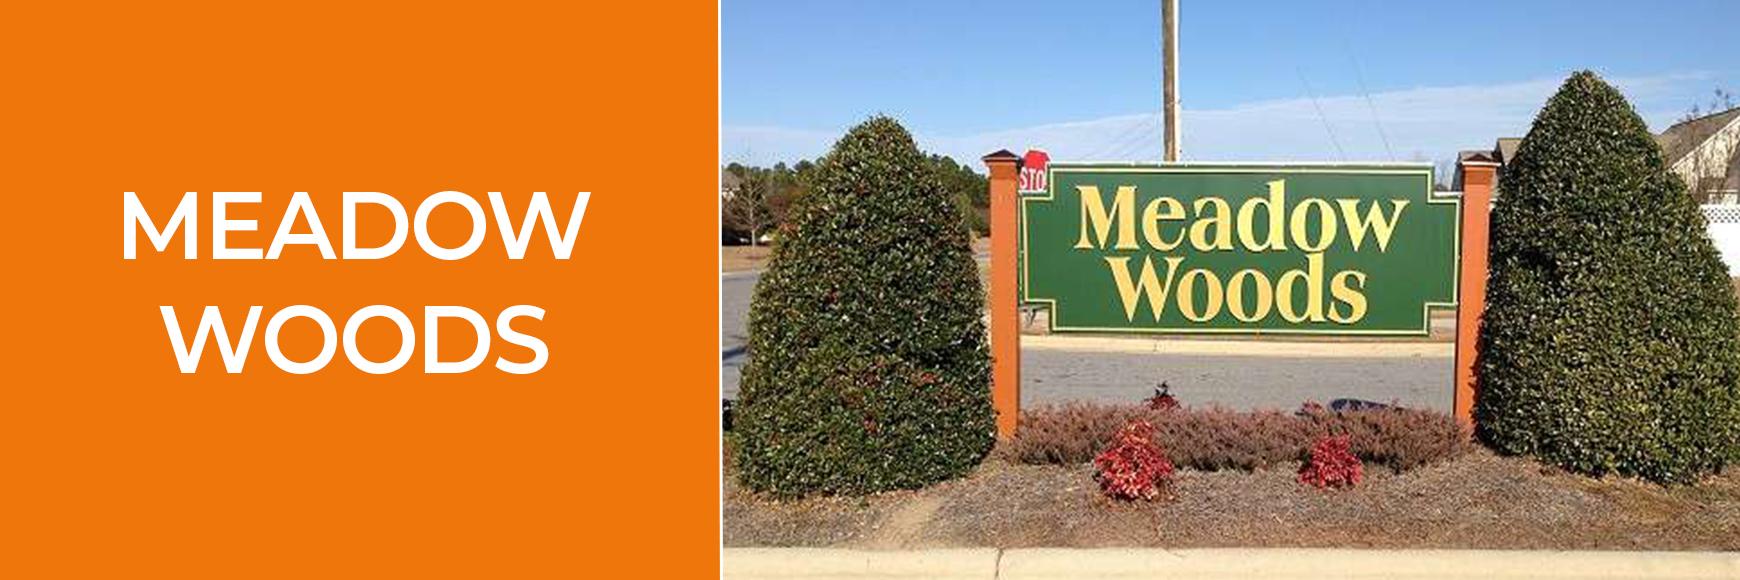 Imóveis em Meadow Woods -Banner-Orlando Homes Sales